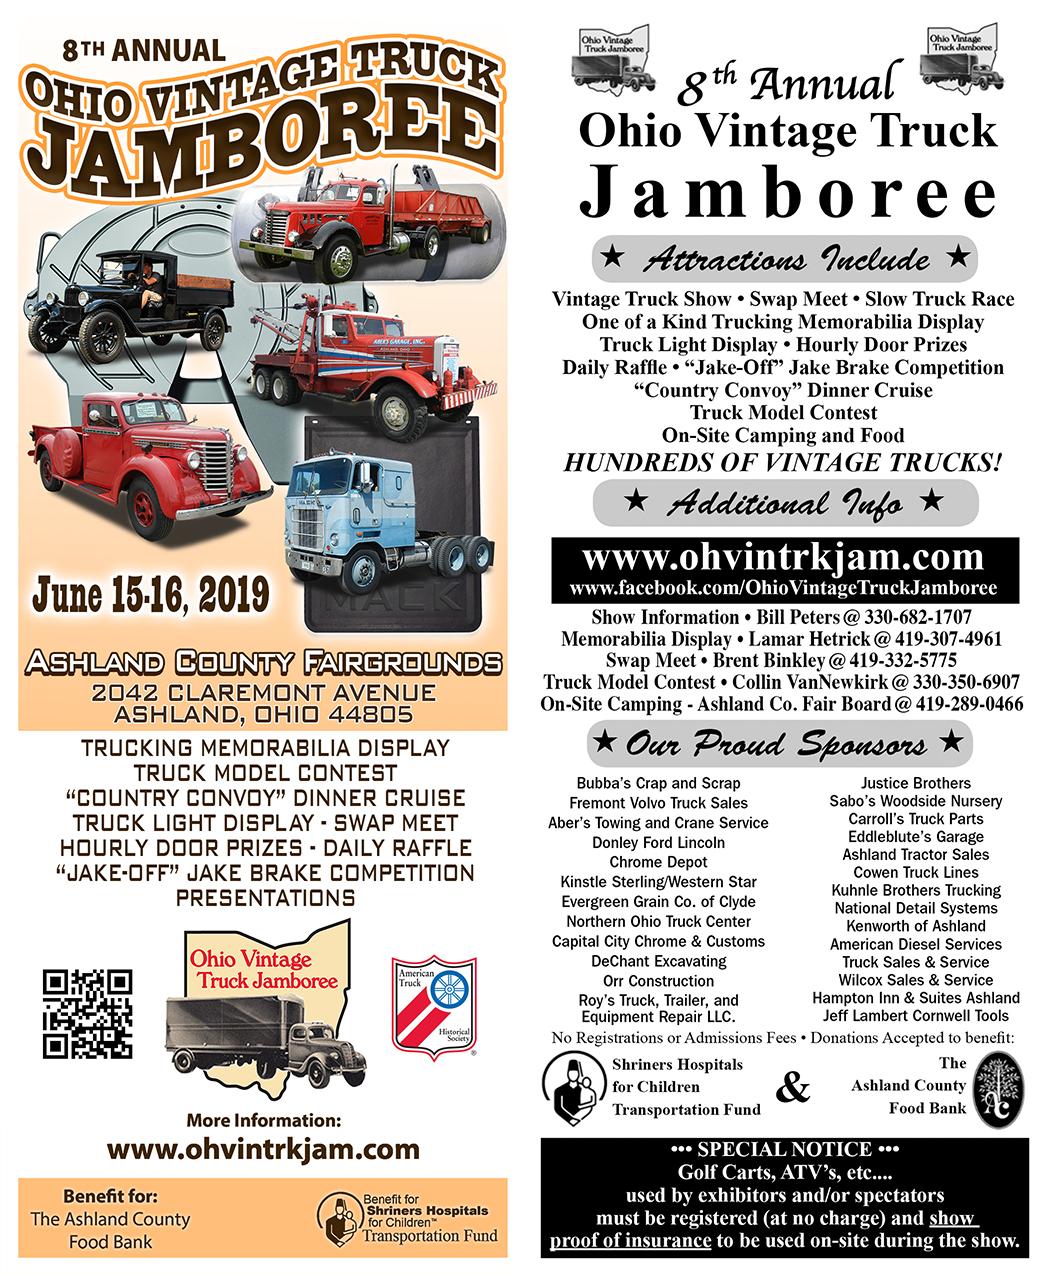 8th Annual Ohio Vintage Truck Jamboree   Car Show Radar